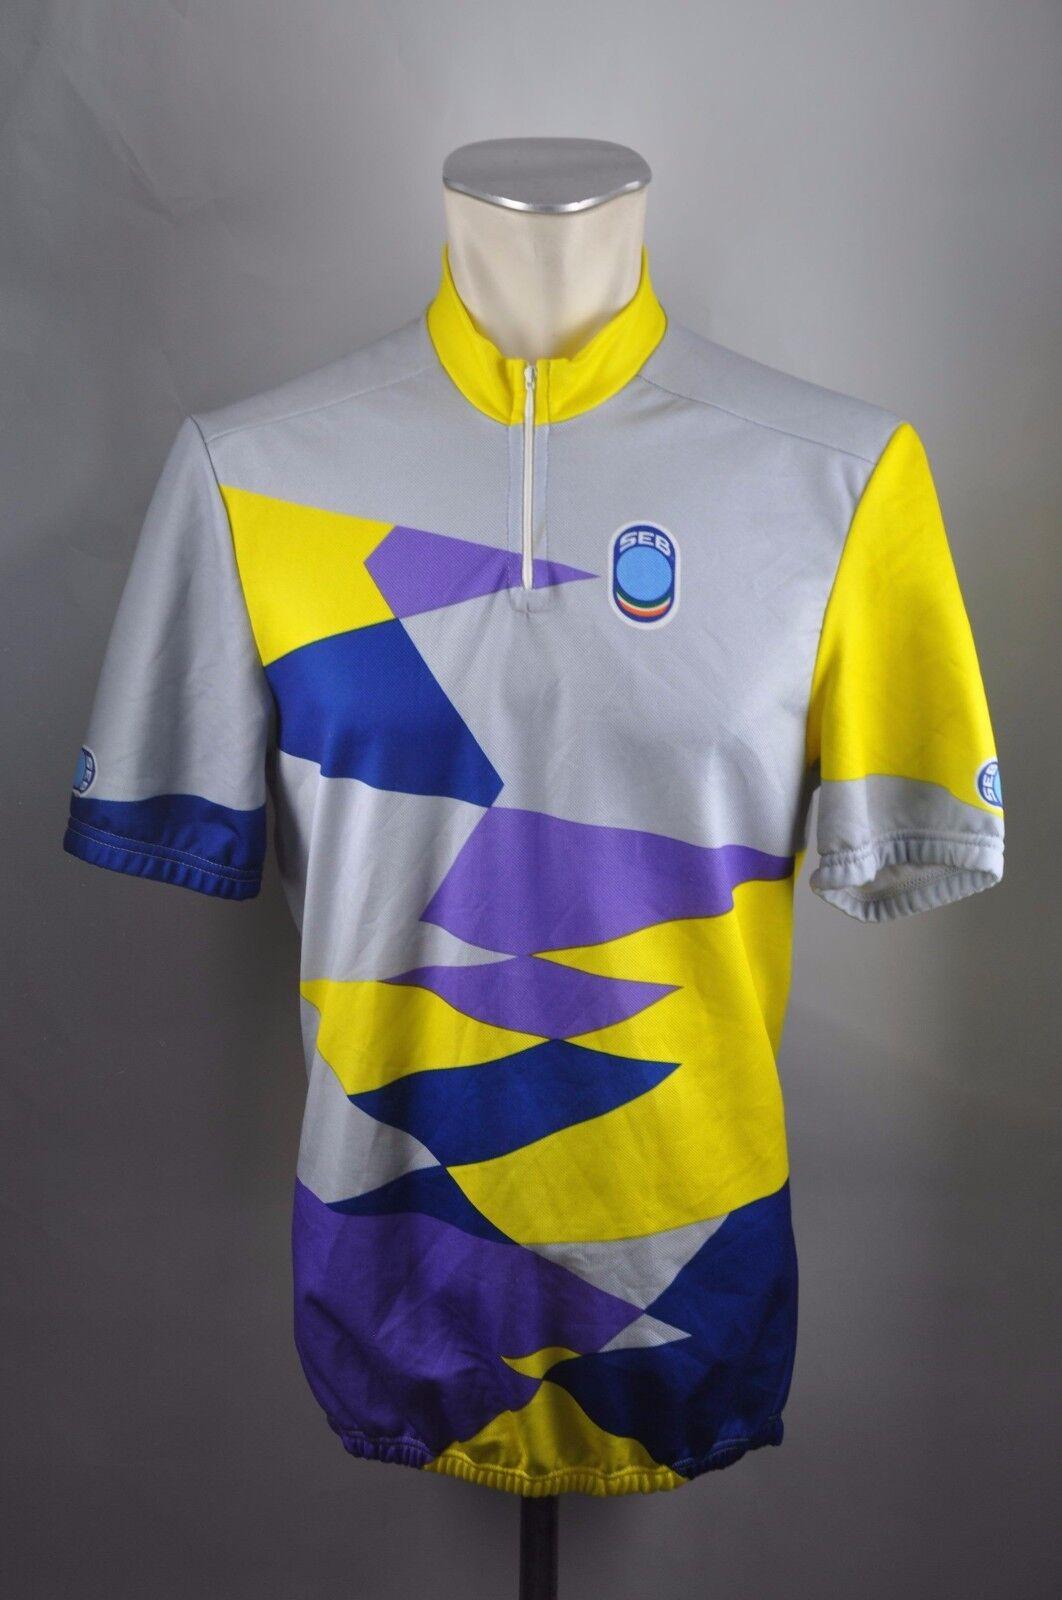 Seb vintage cycling jersey Fahrrad Bike Rad Rad Rad Trikot XL XXL 56cm U8 cd6167